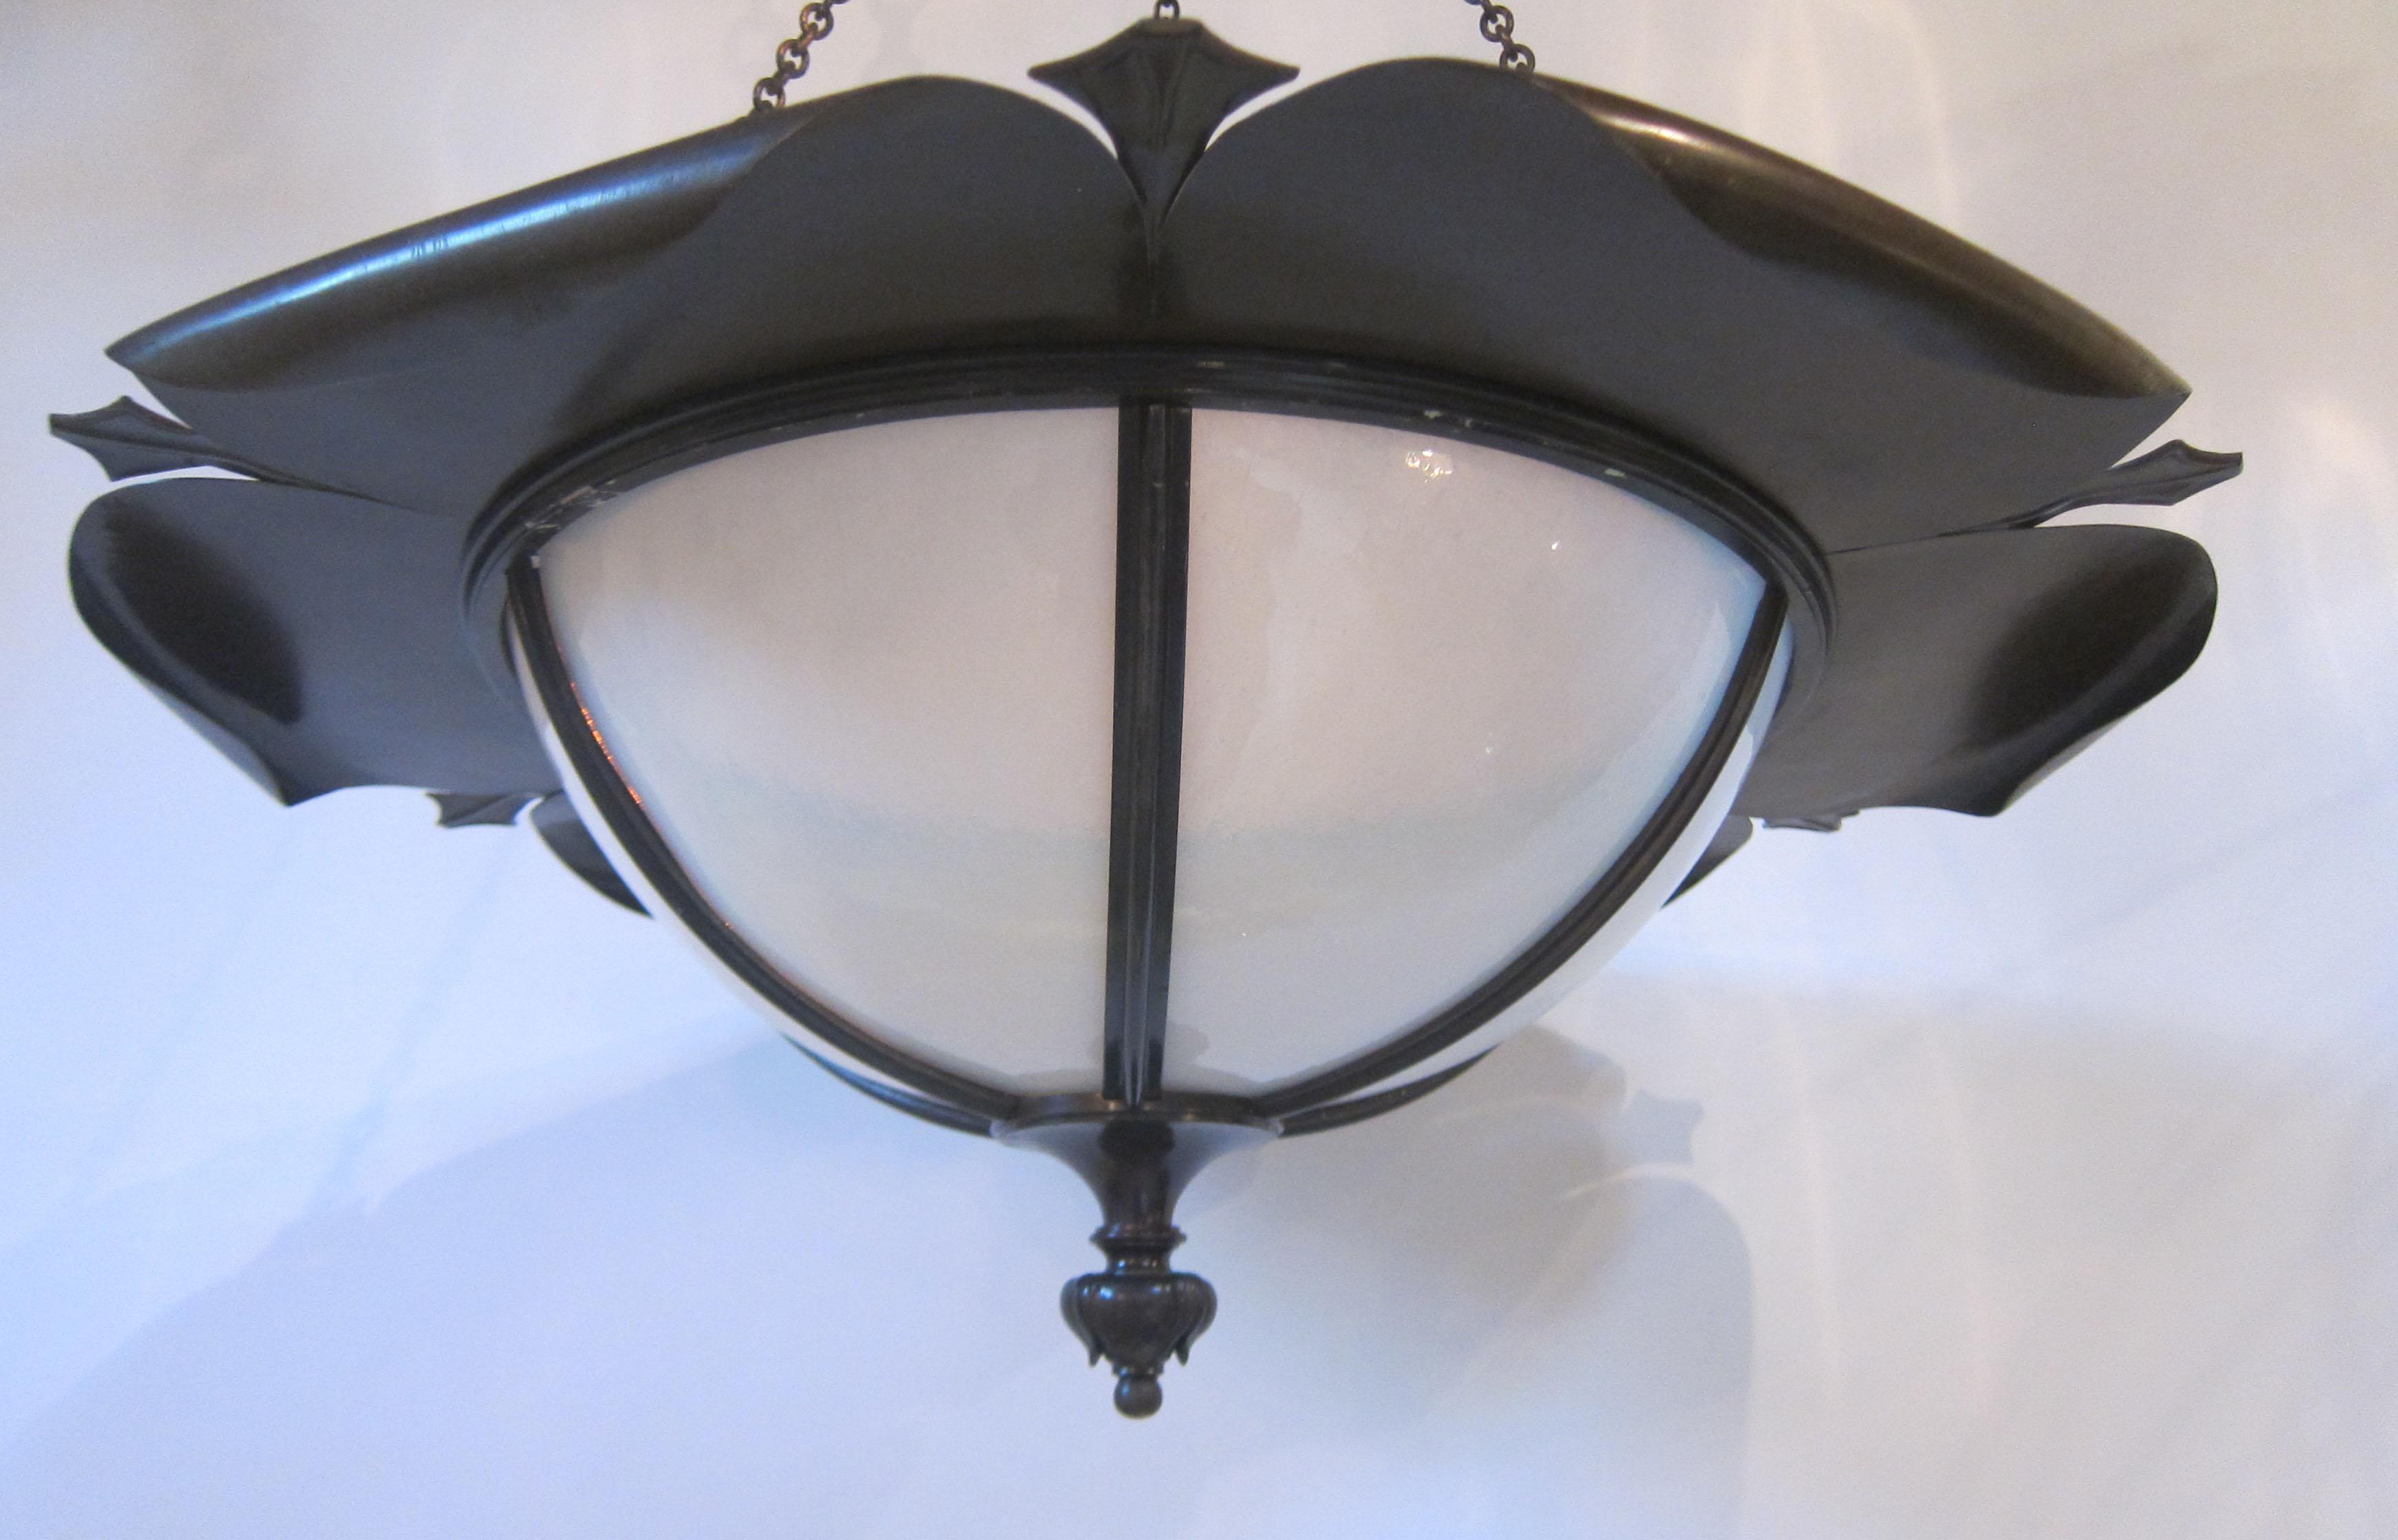 Ceiling Light In The Style Of Was Benson & Benson Lighting - Democraciaejustica